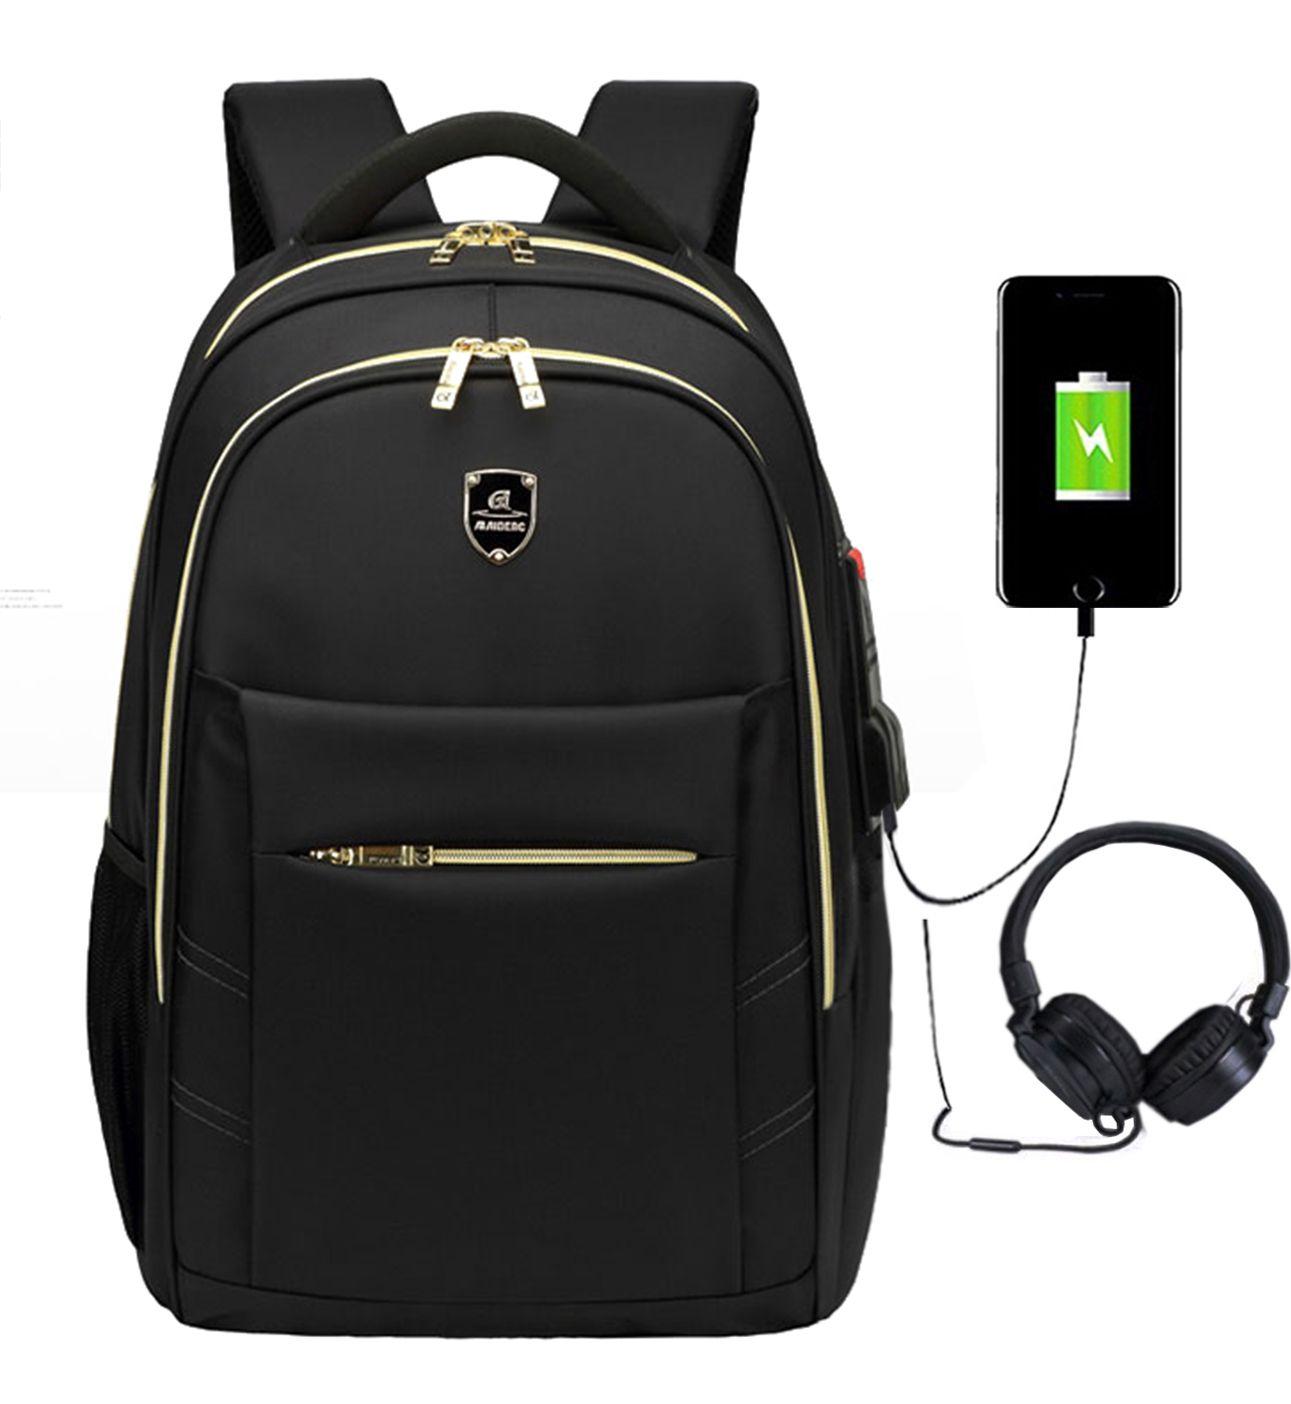 Mochila Notebook Escolar Saída USB Fone Impermeável M1801